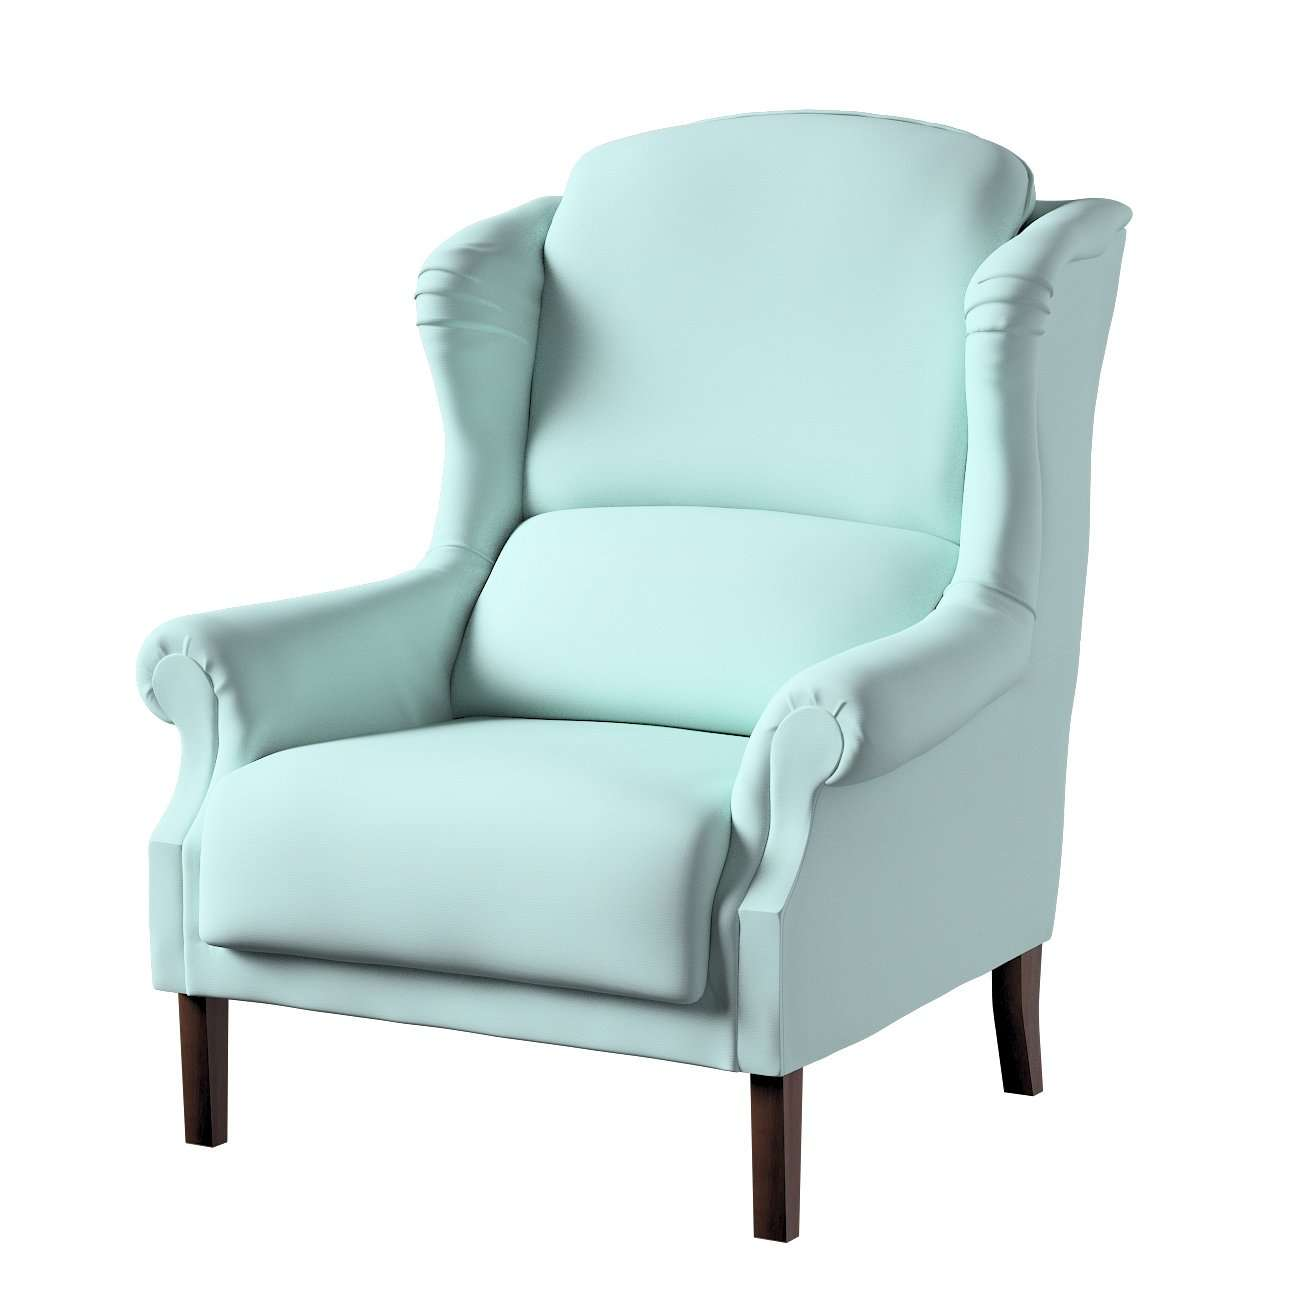 Fotel Unique w kolekcji Cotton Panama, tkanina: 702-10